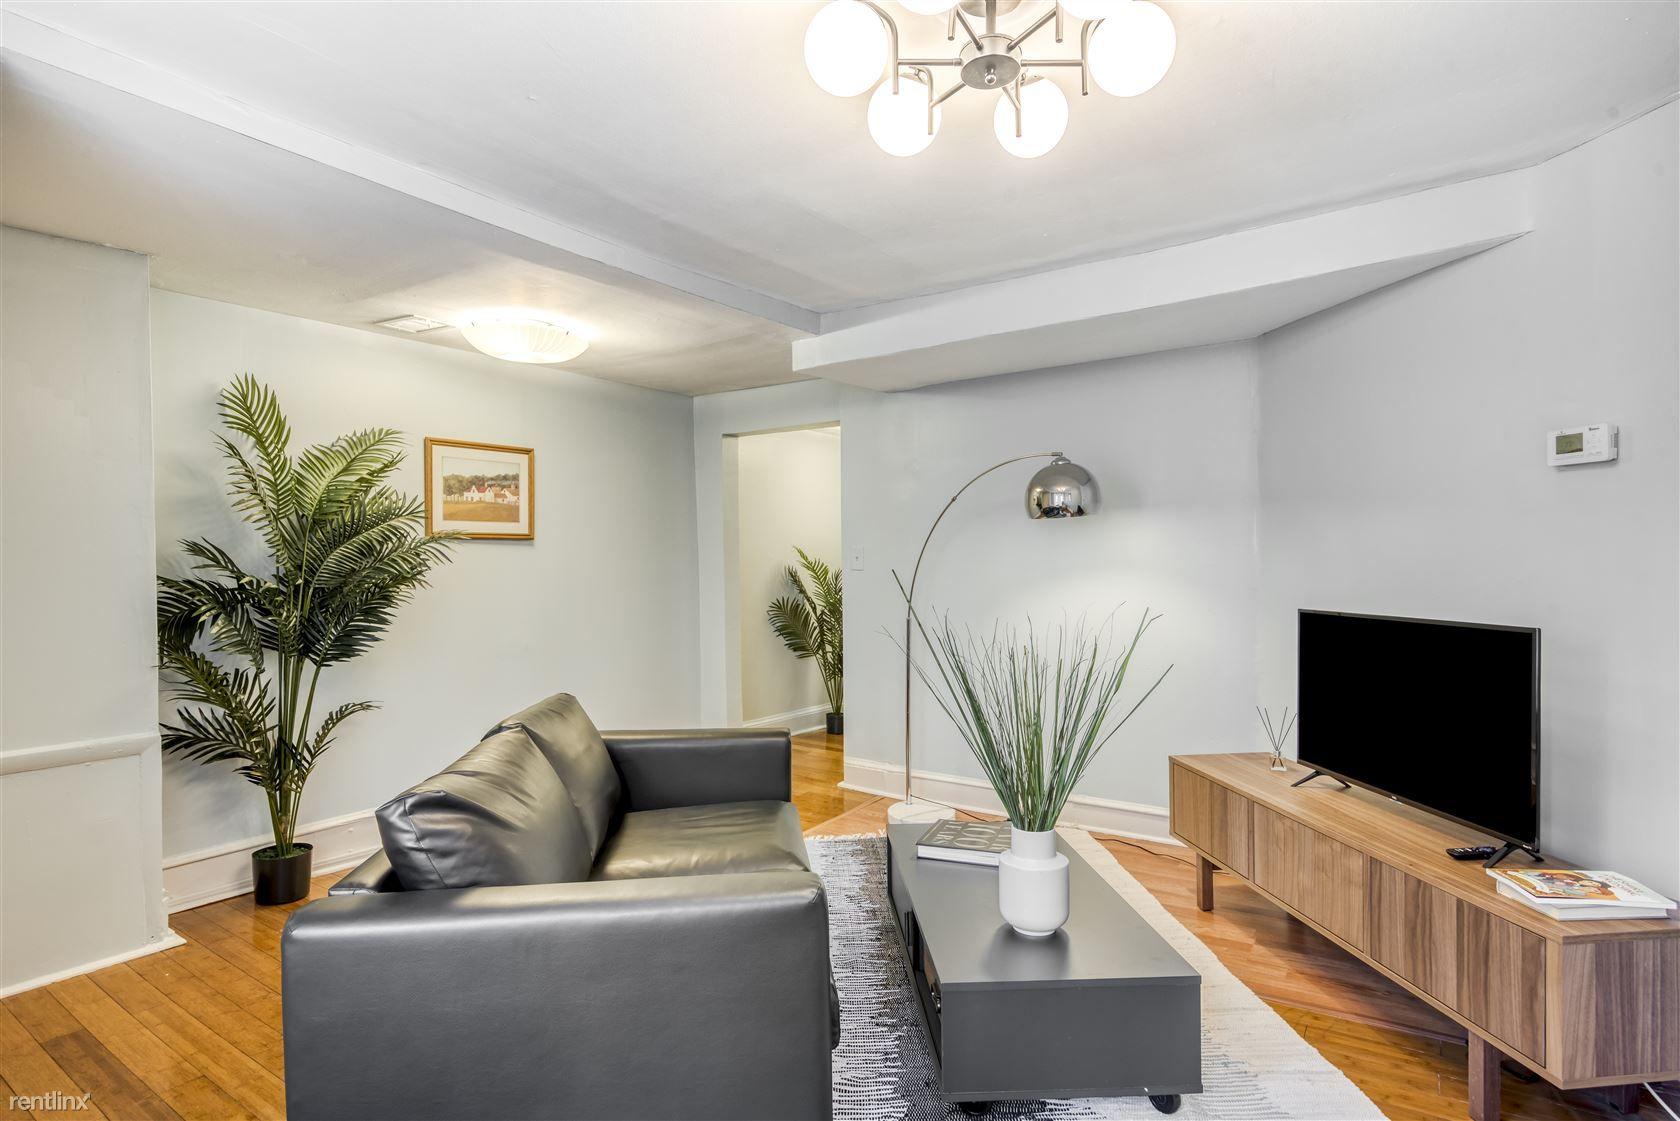 424 Elm St NW, Washington DC, DC, 20001 for rent